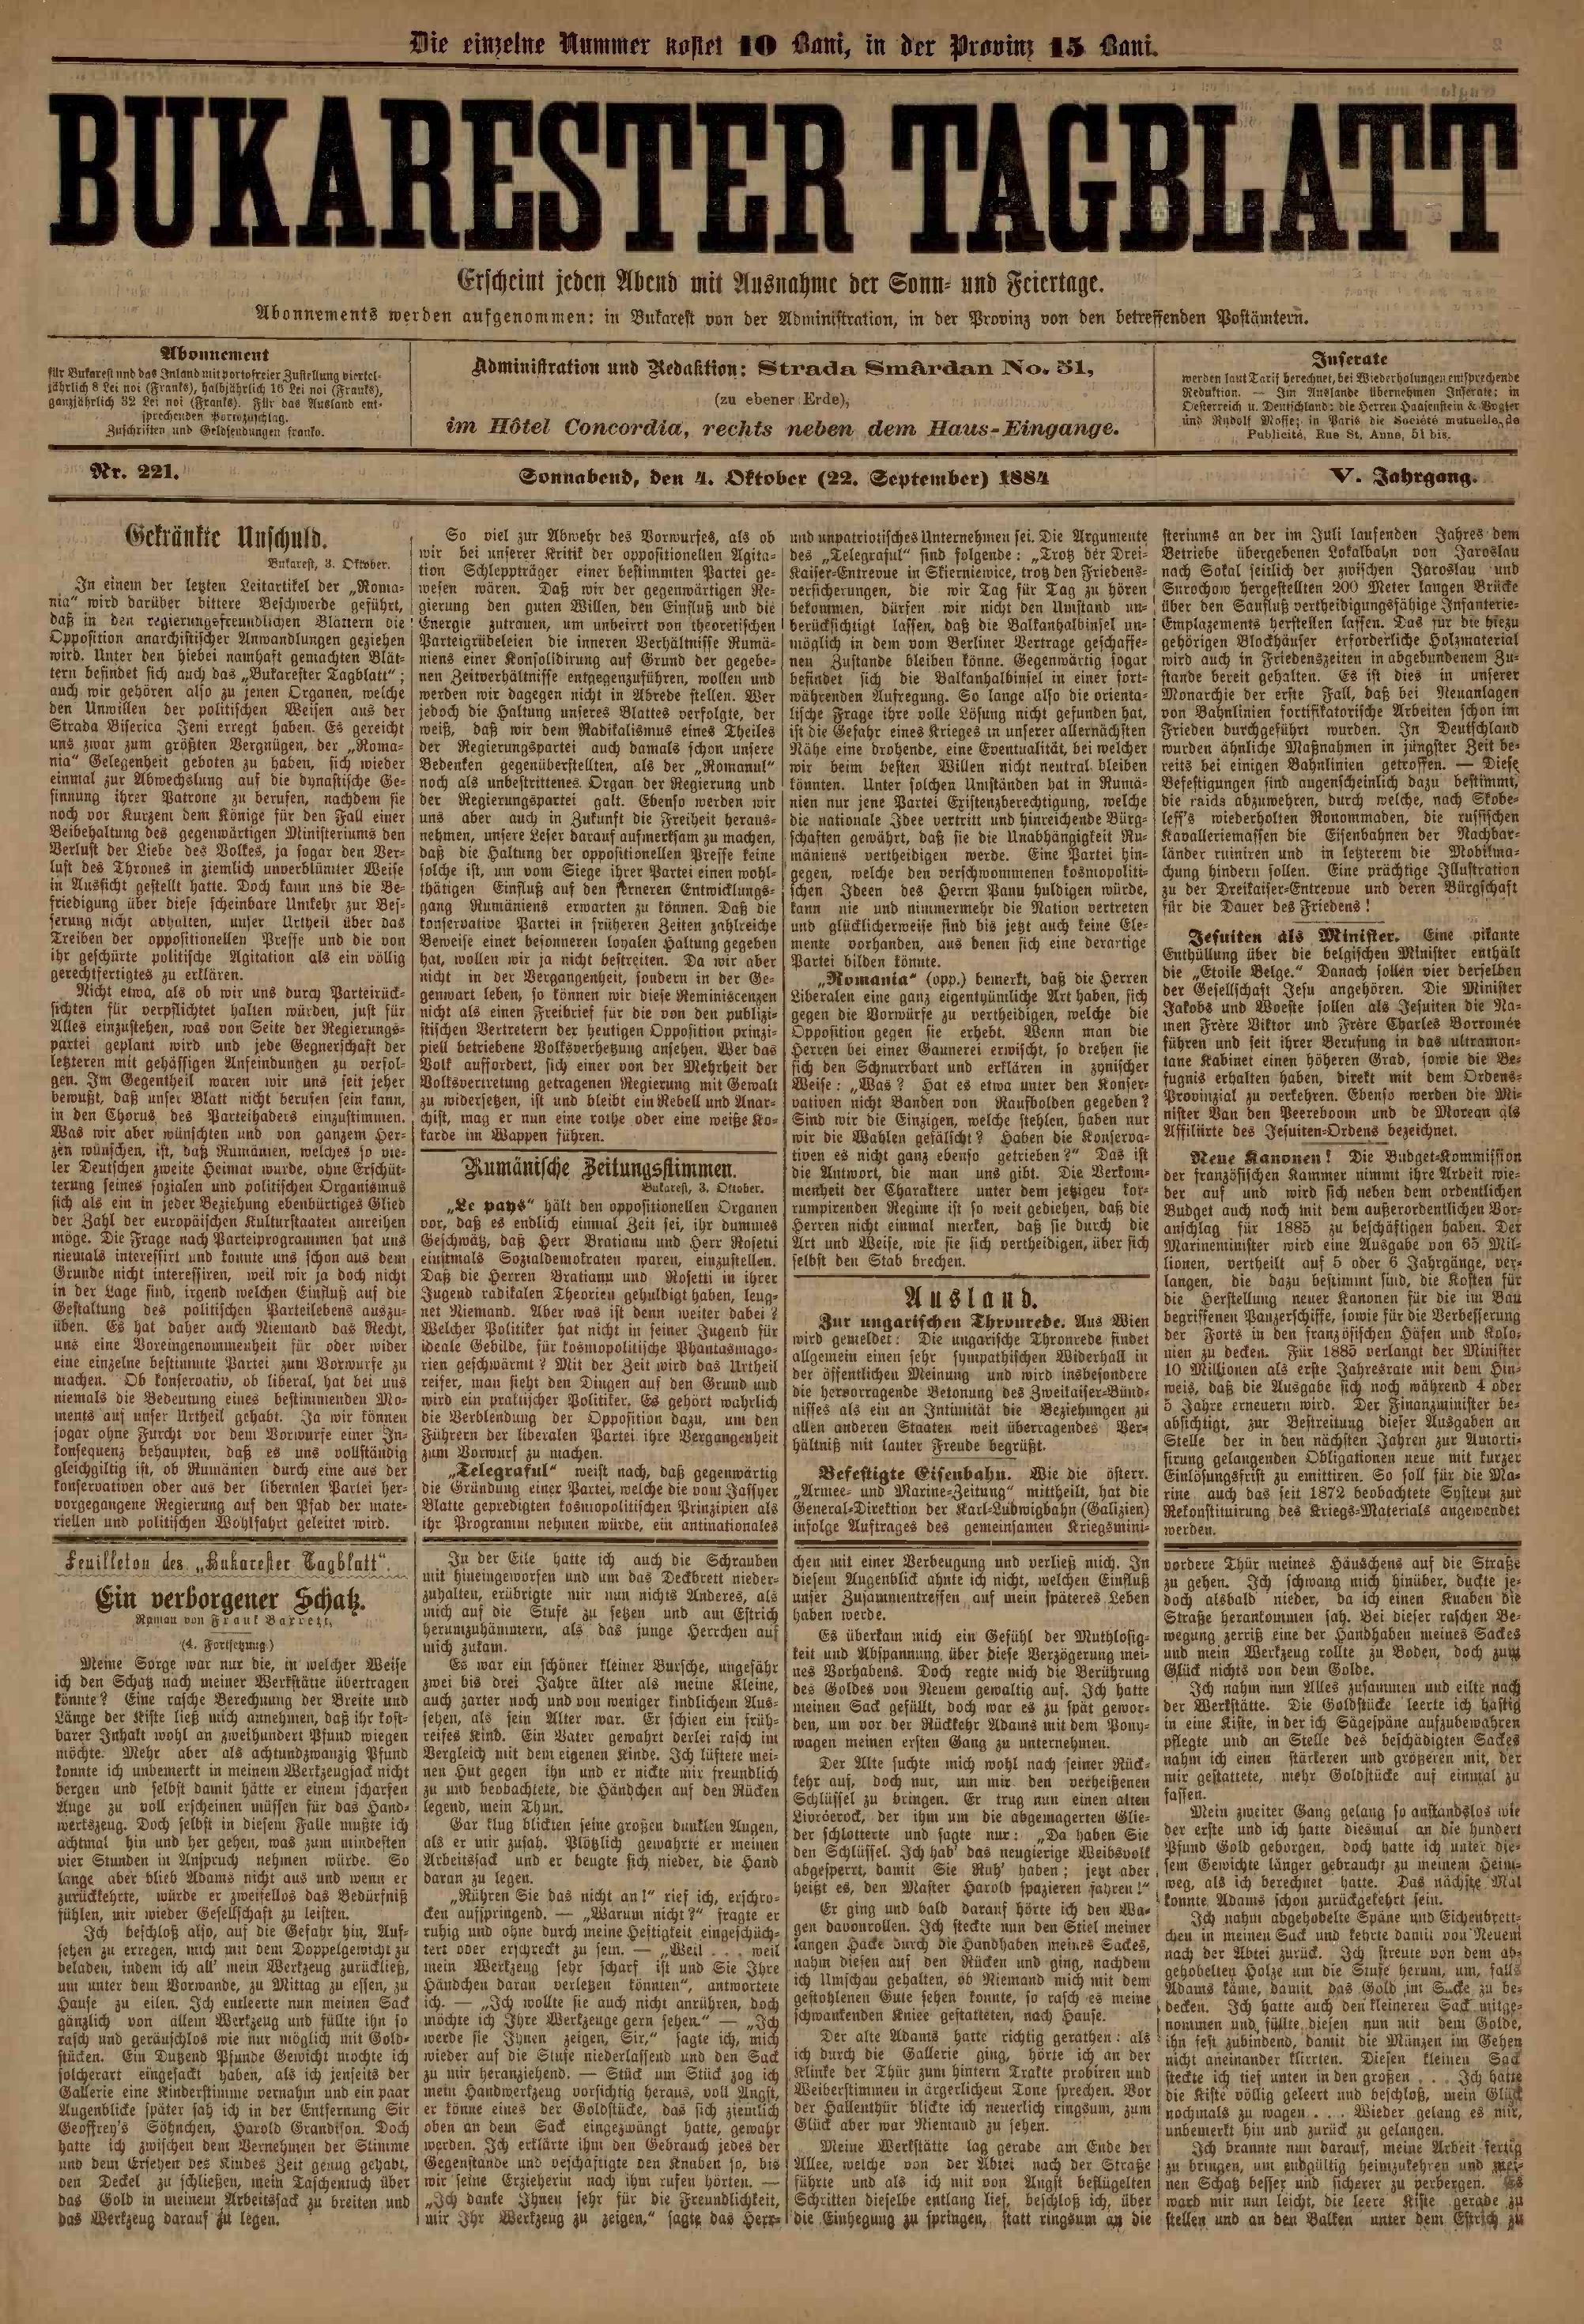 File:Bukarester Tagblatt 1884-10-04, nr  221 pdf - Wikimedia Commons